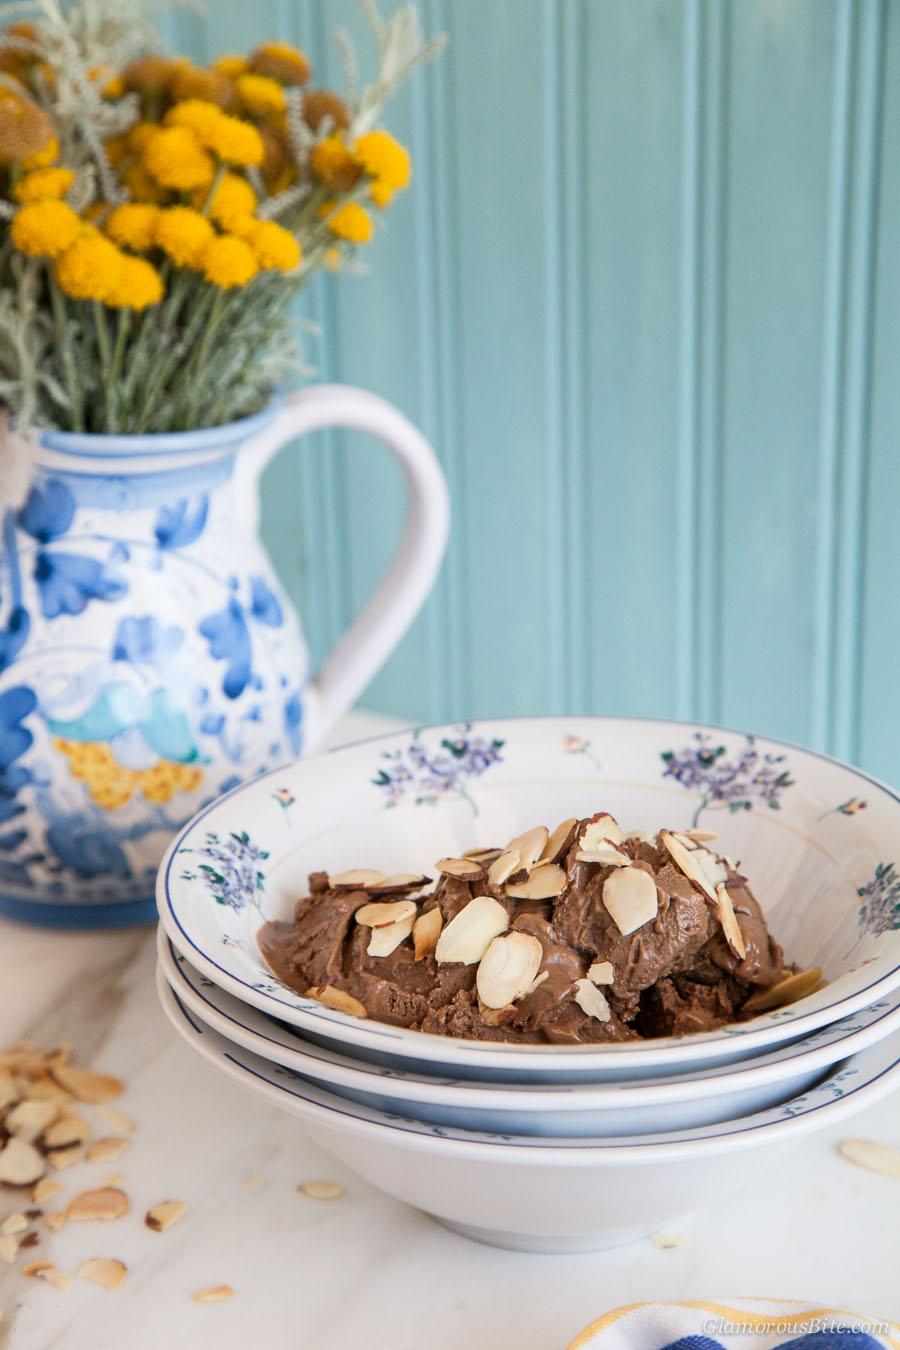 Chocolate Almond Gelato Dairy Free Gluten Free